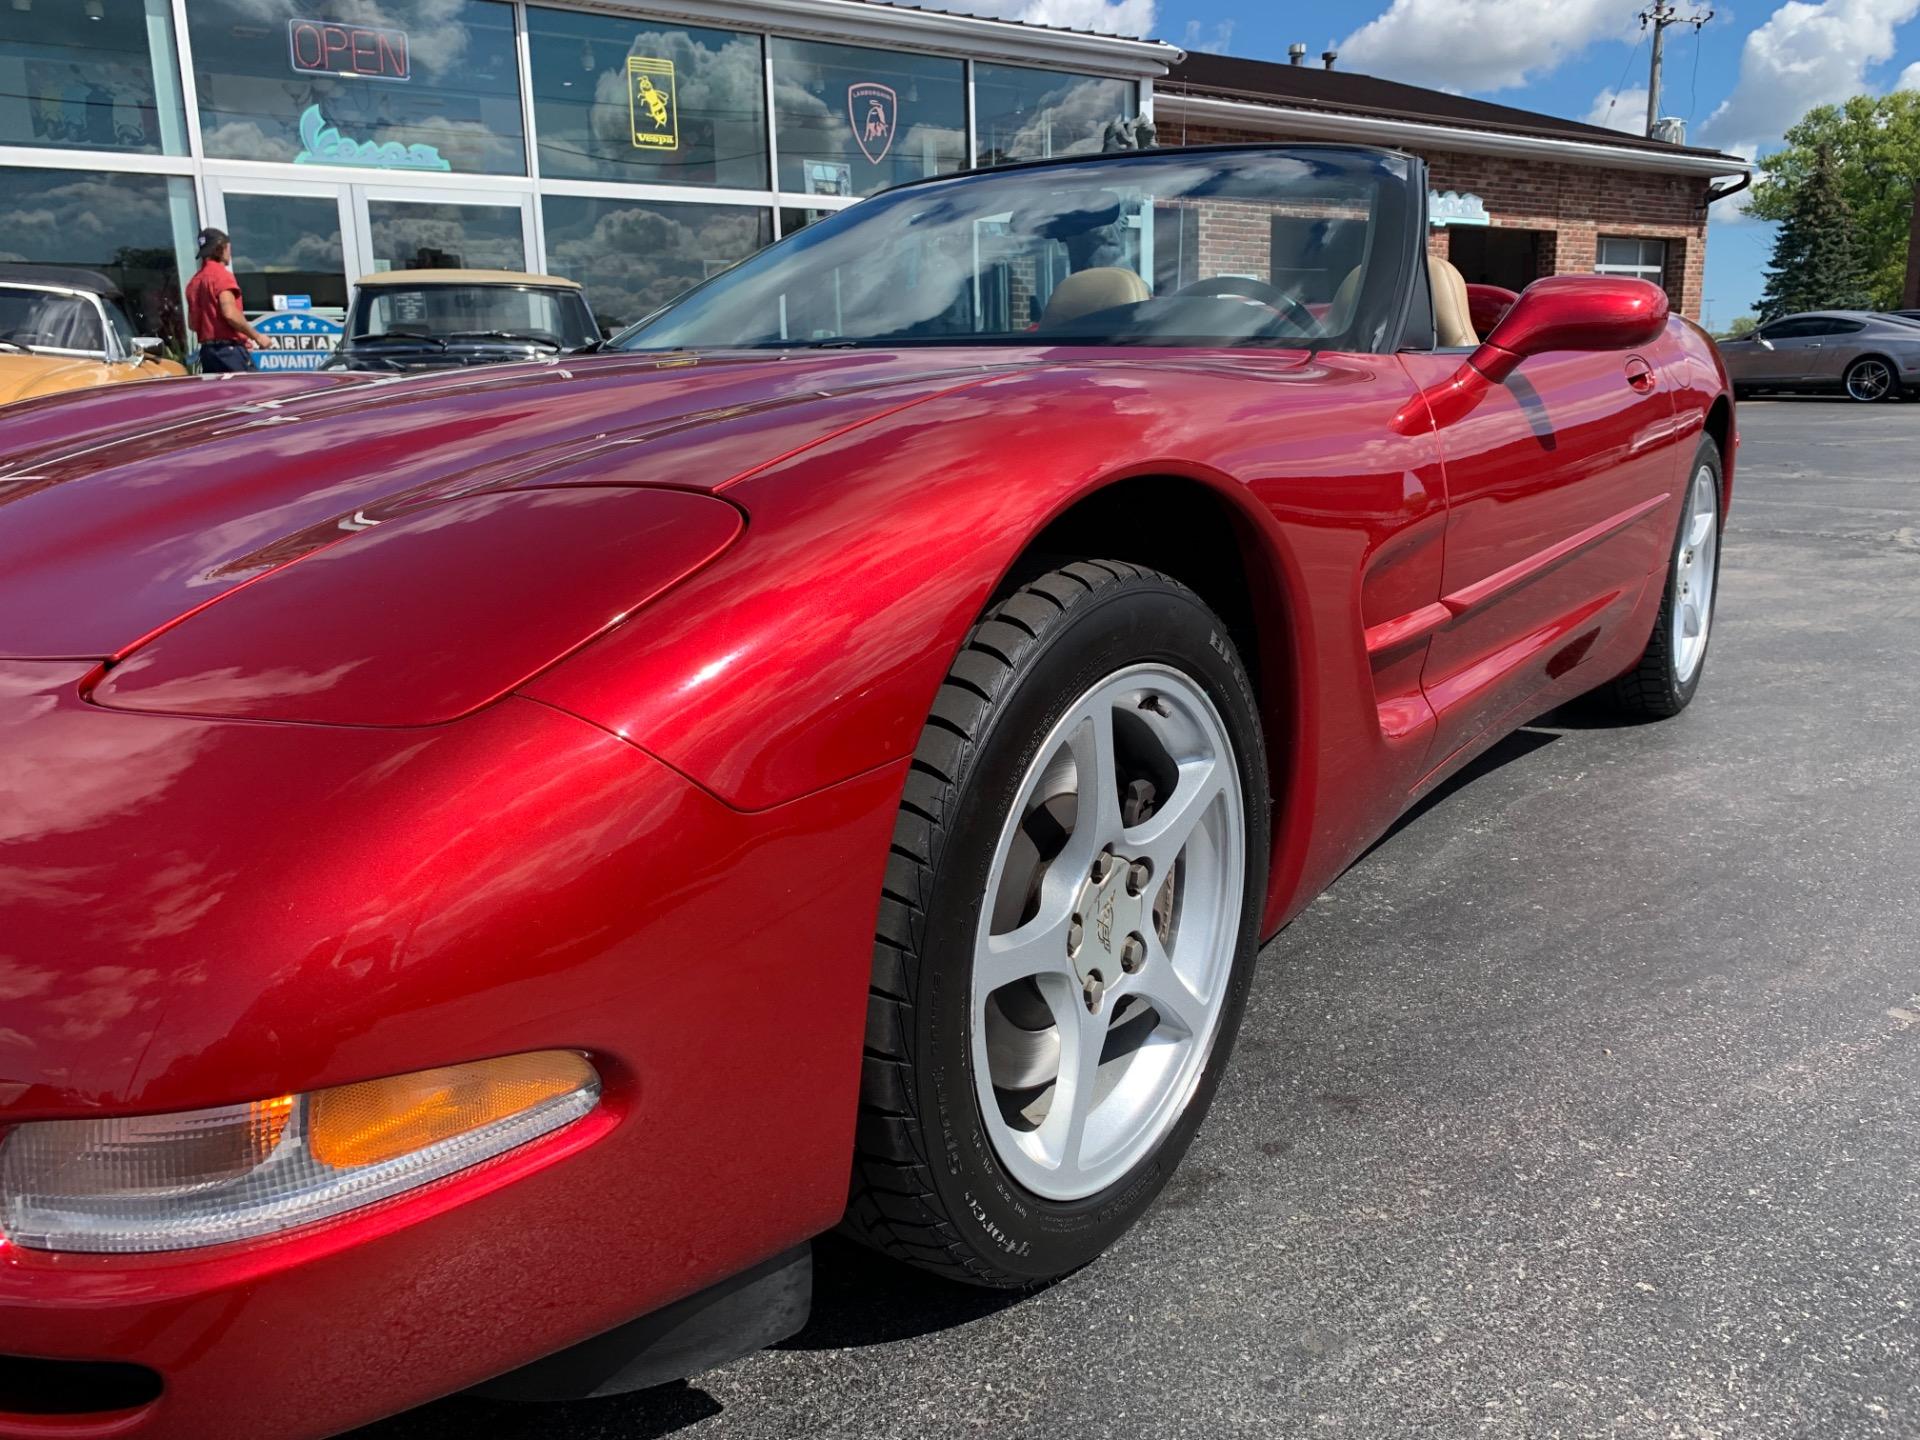 Used-2000-Chevrolet-Corvette-Convertible